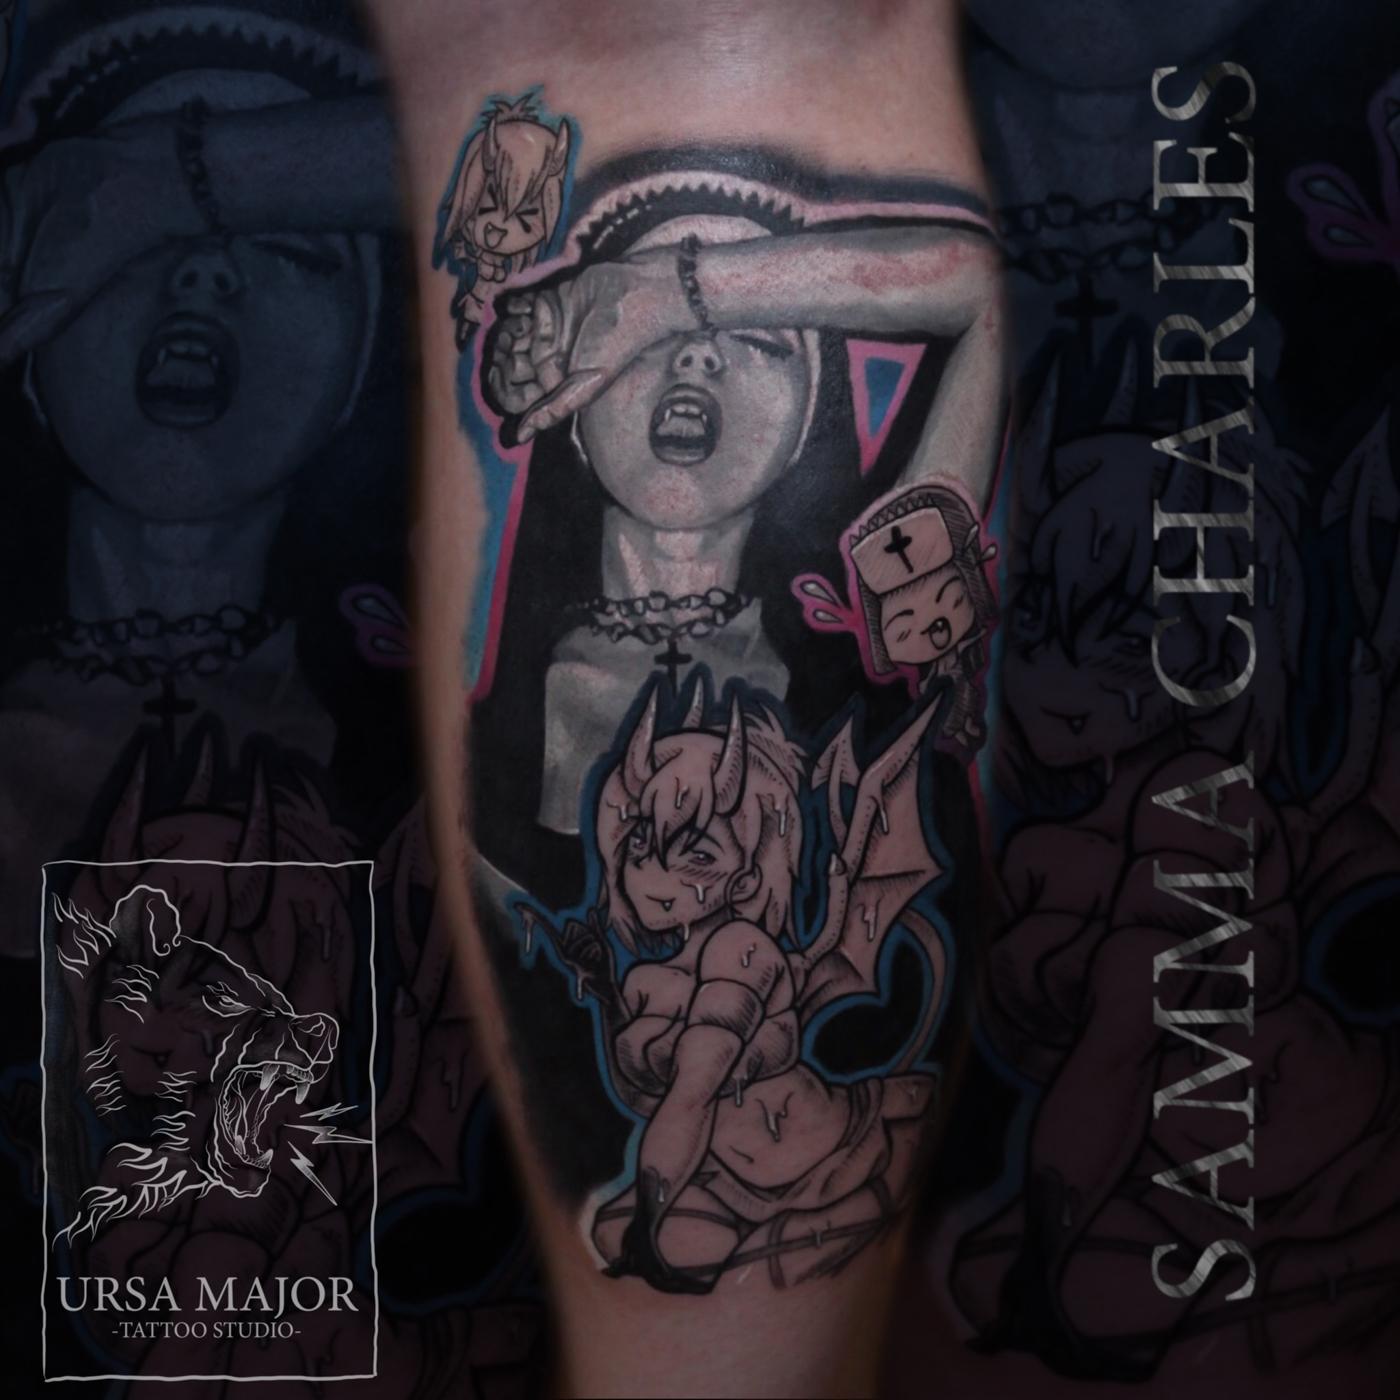 oxfordshire-tattoo-studio-46.jpg